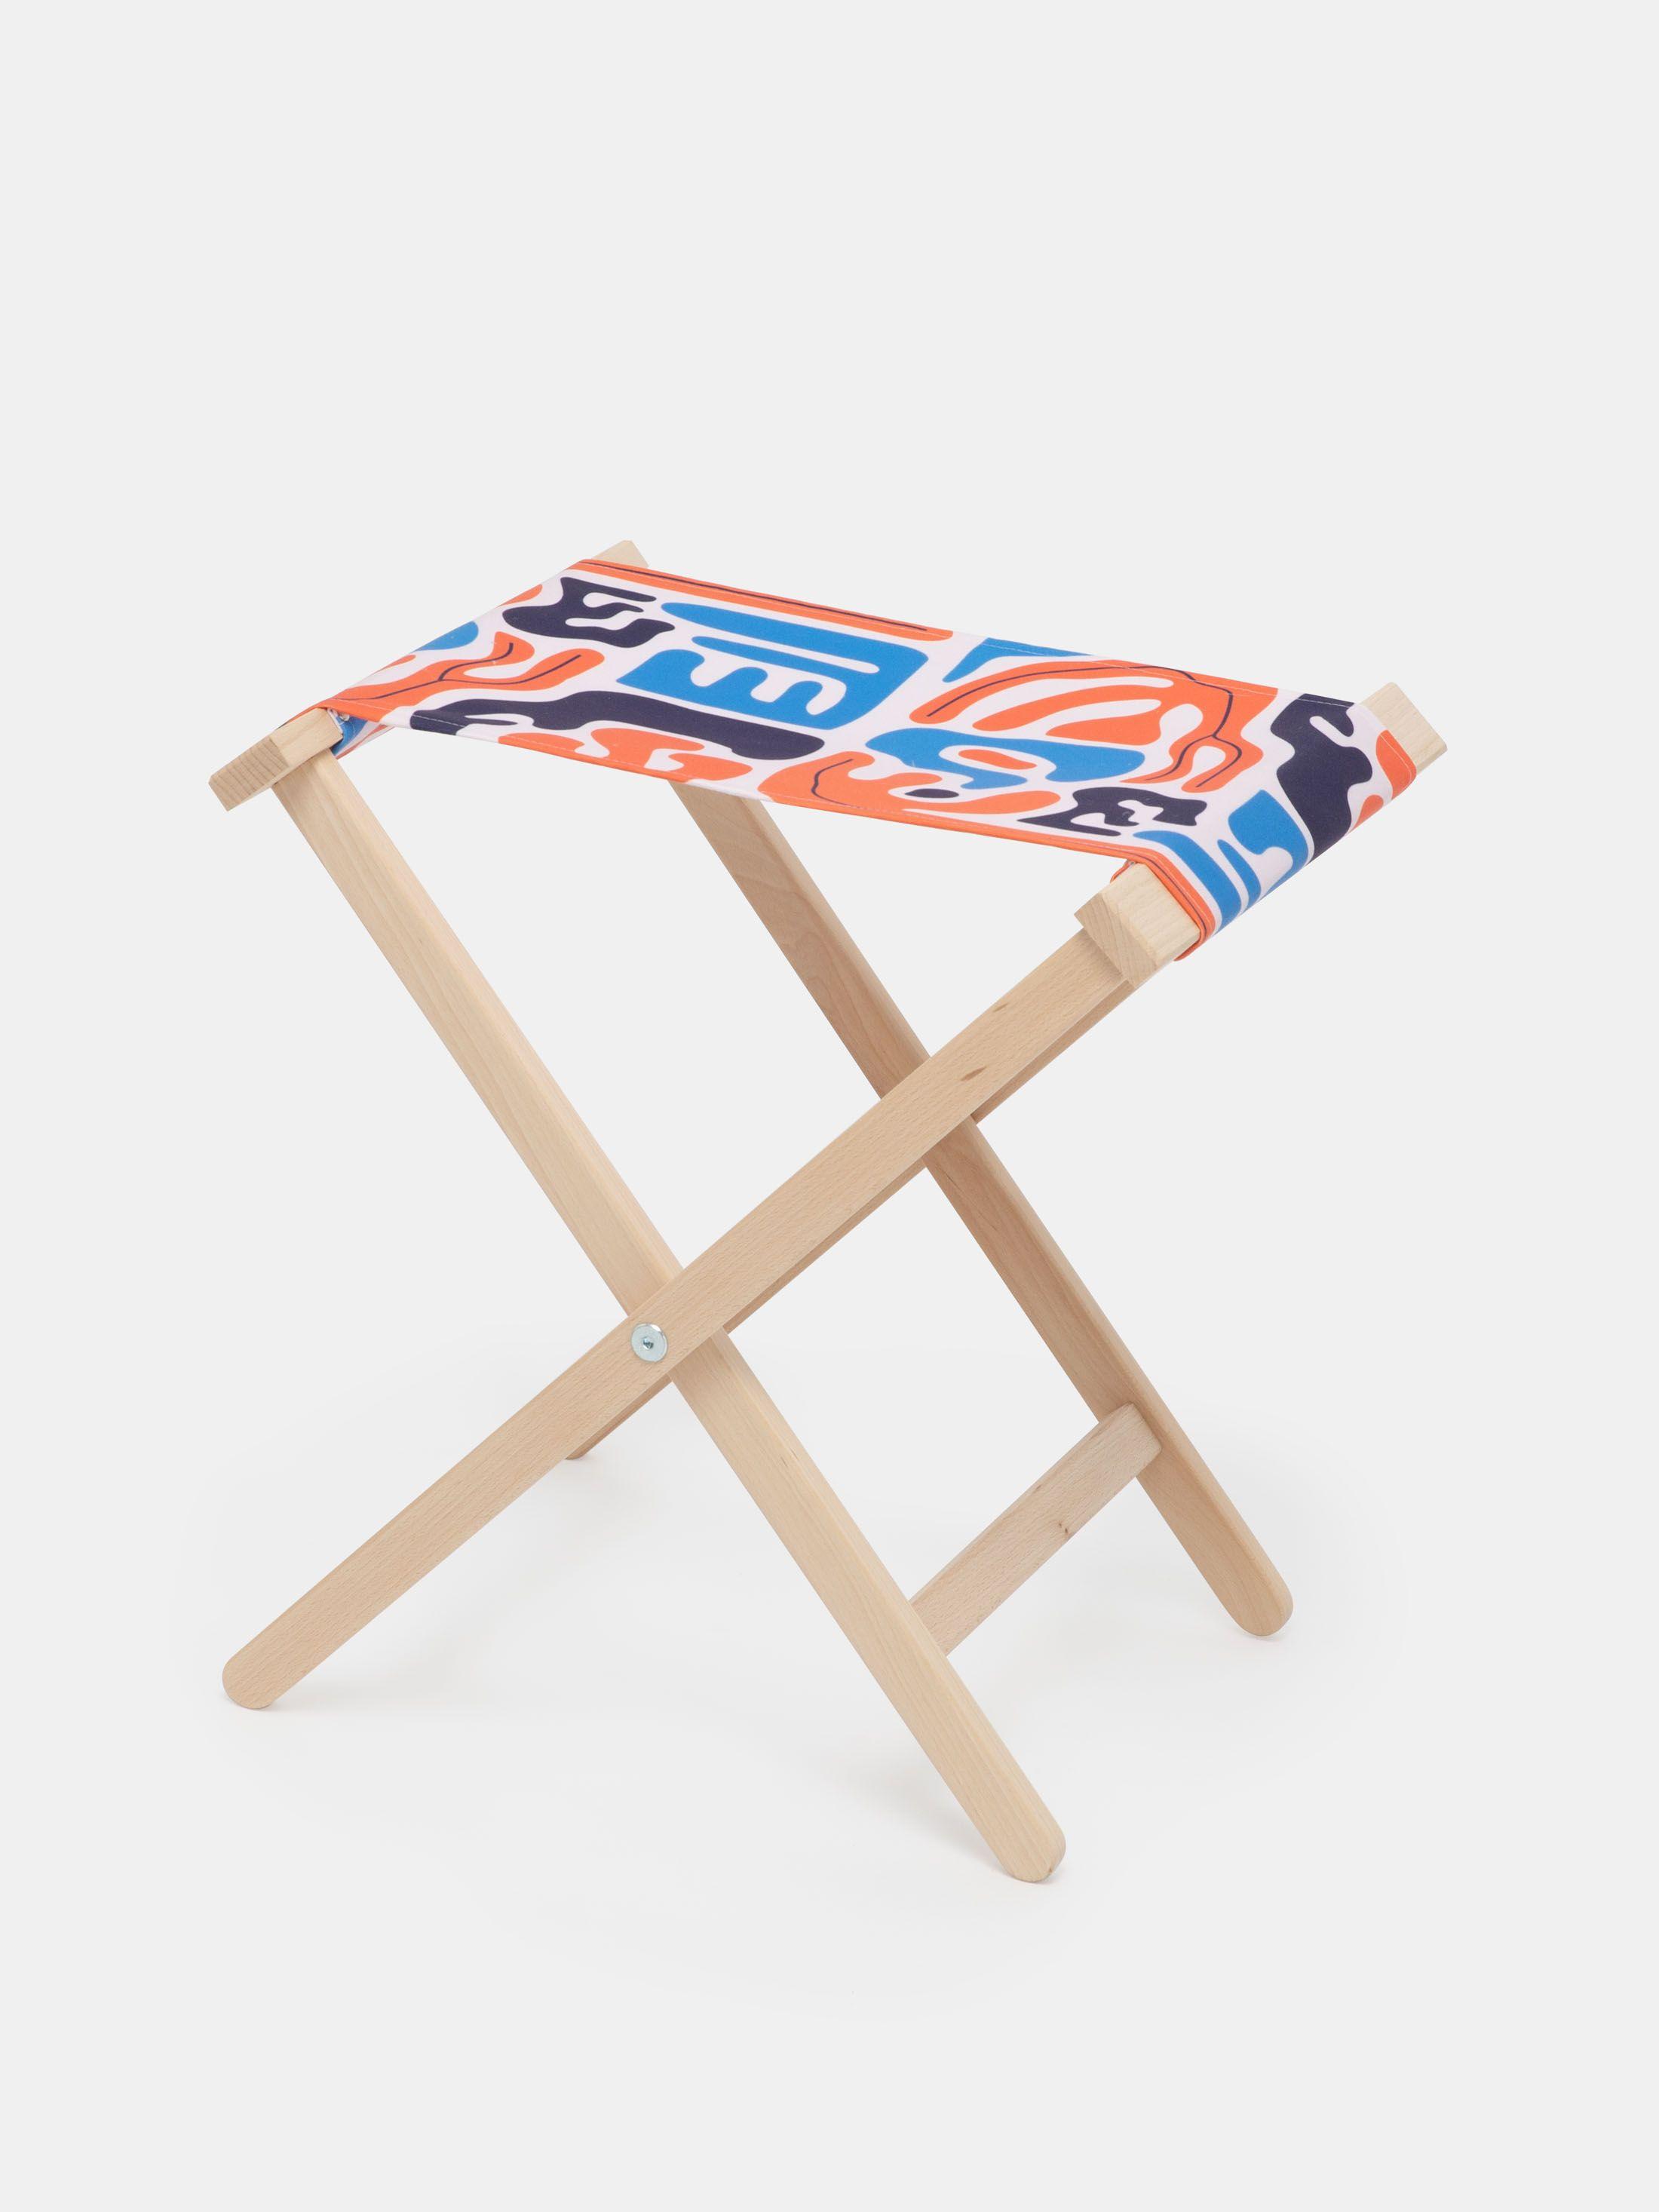 folding camp stool hinge details